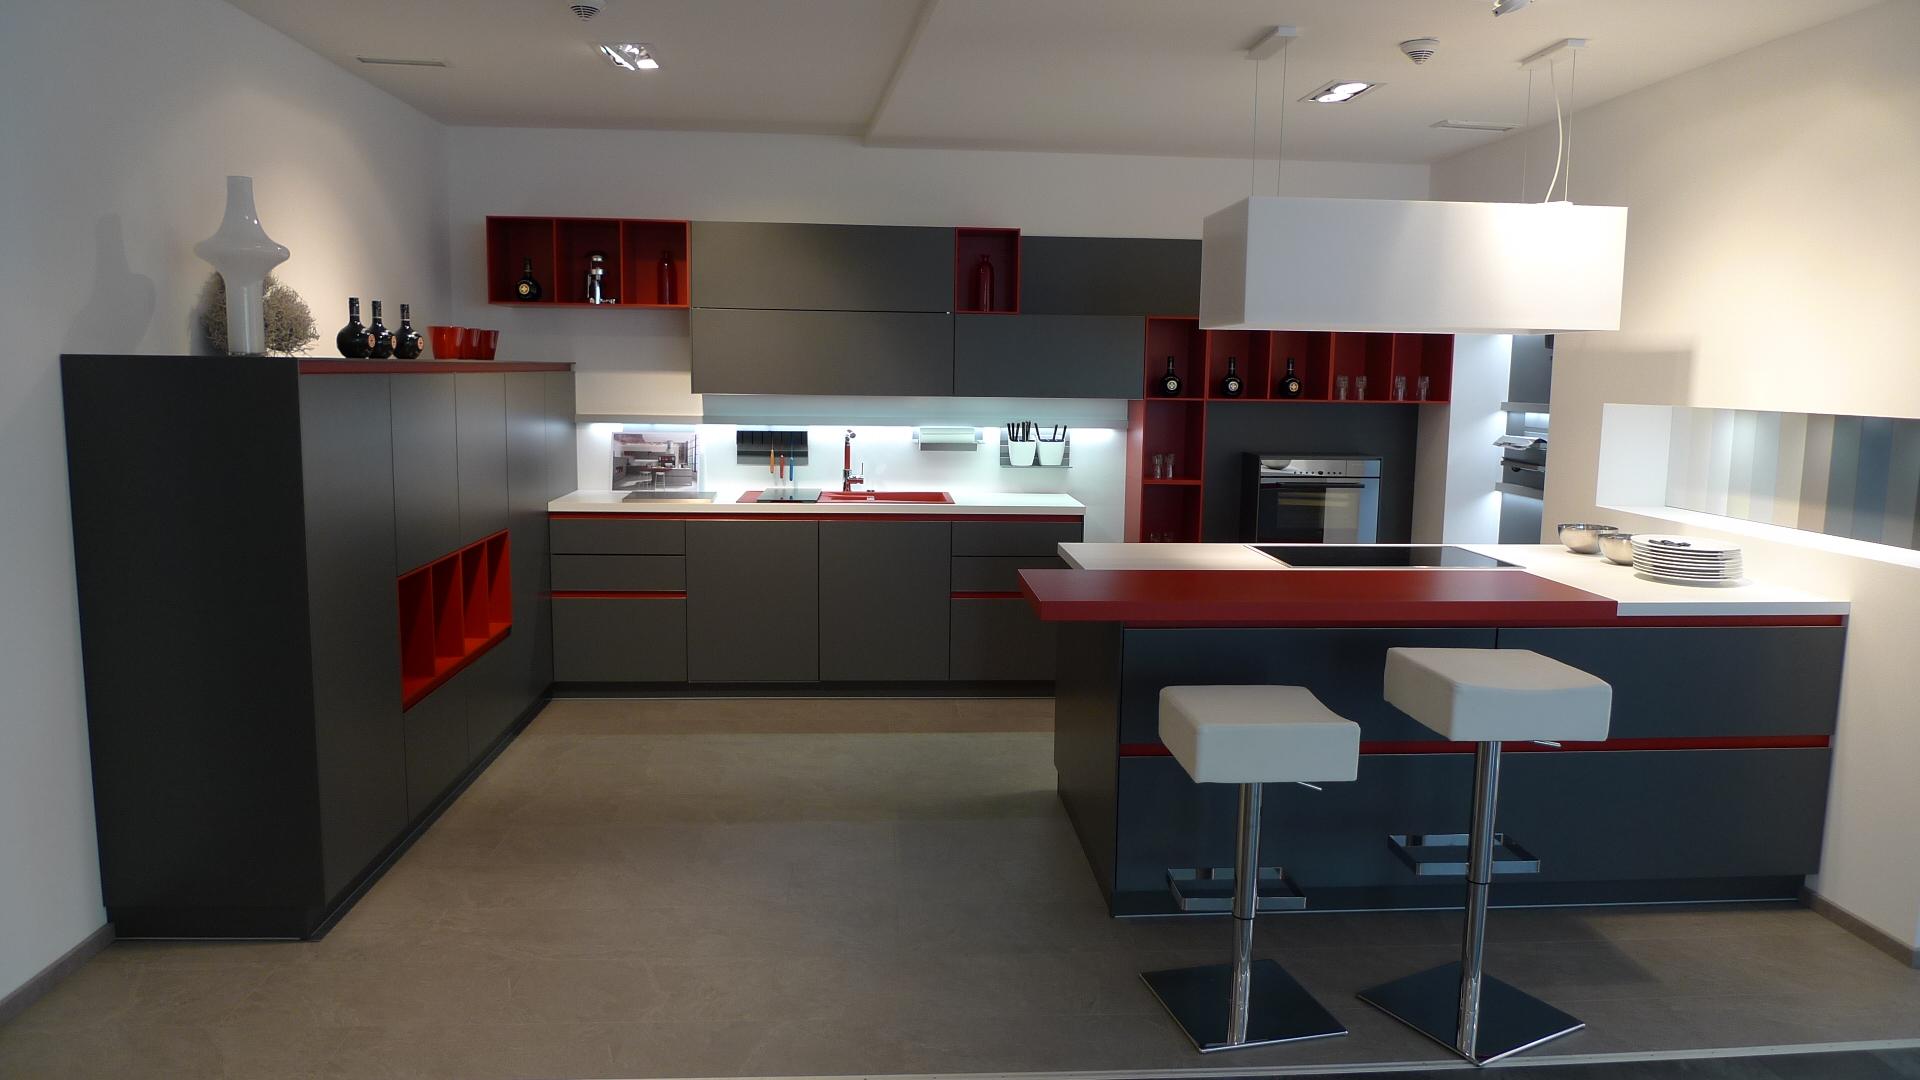 Design keukens antwerpen interieur meubilair idee n for Interieur design antwerpen